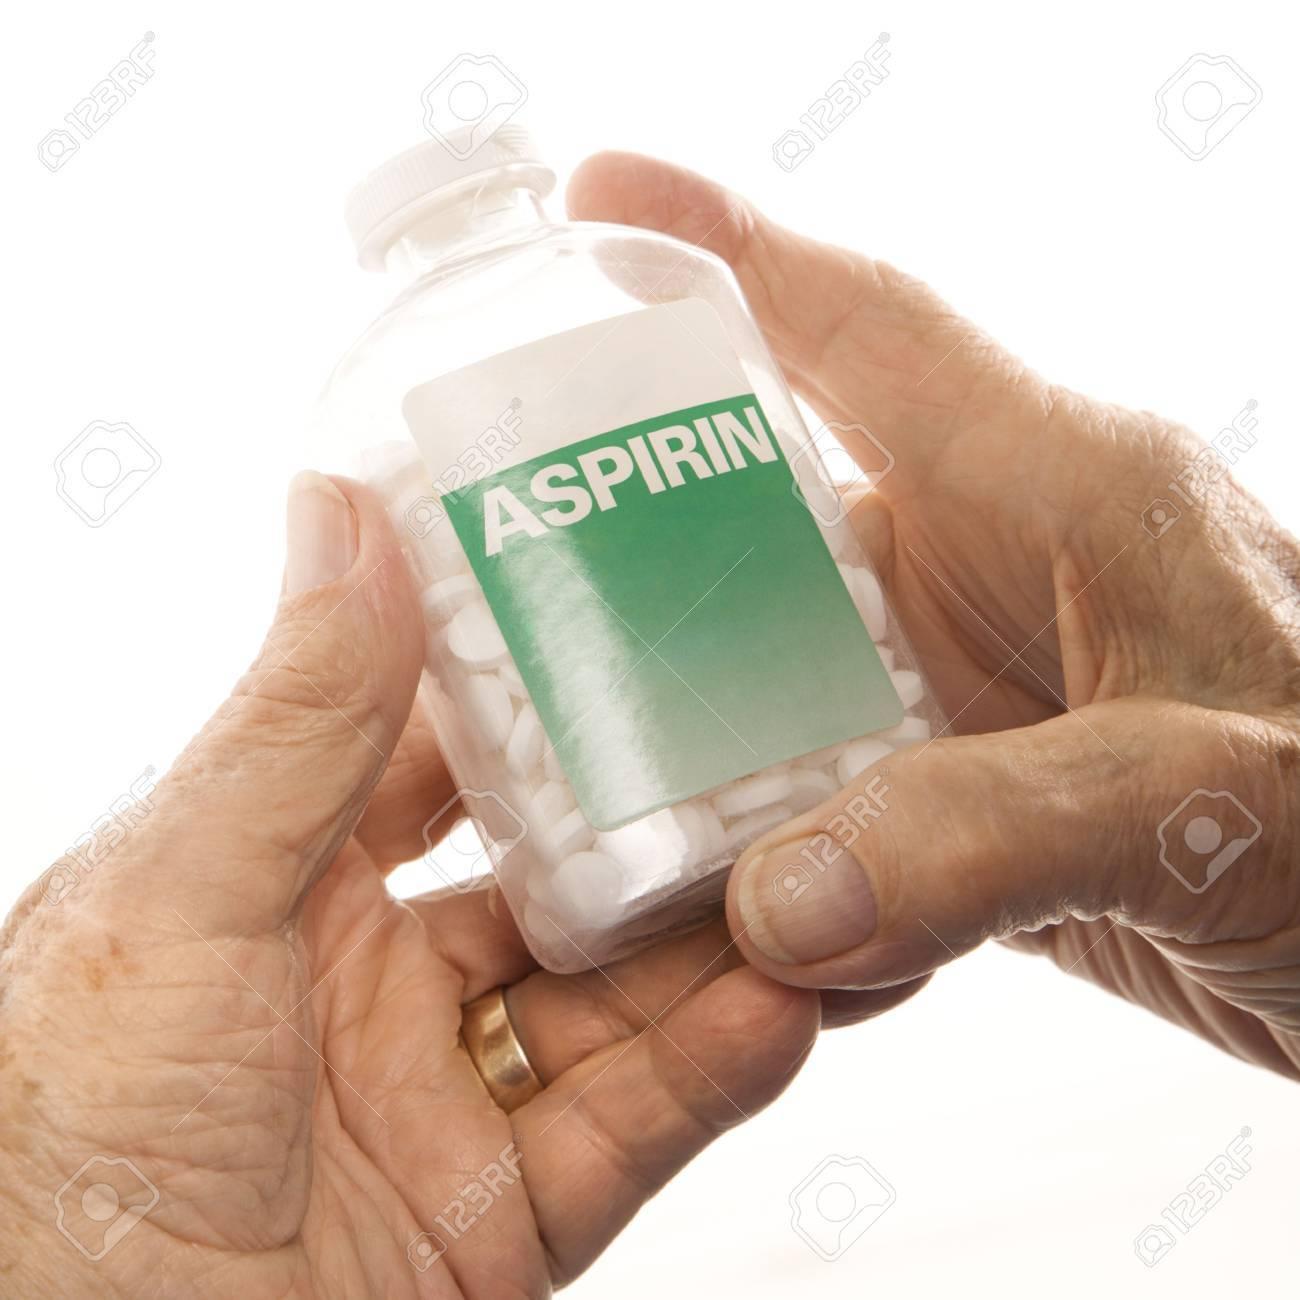 Close-up of elderly male Caucasion hands holding aspirin bottle. - 2246016